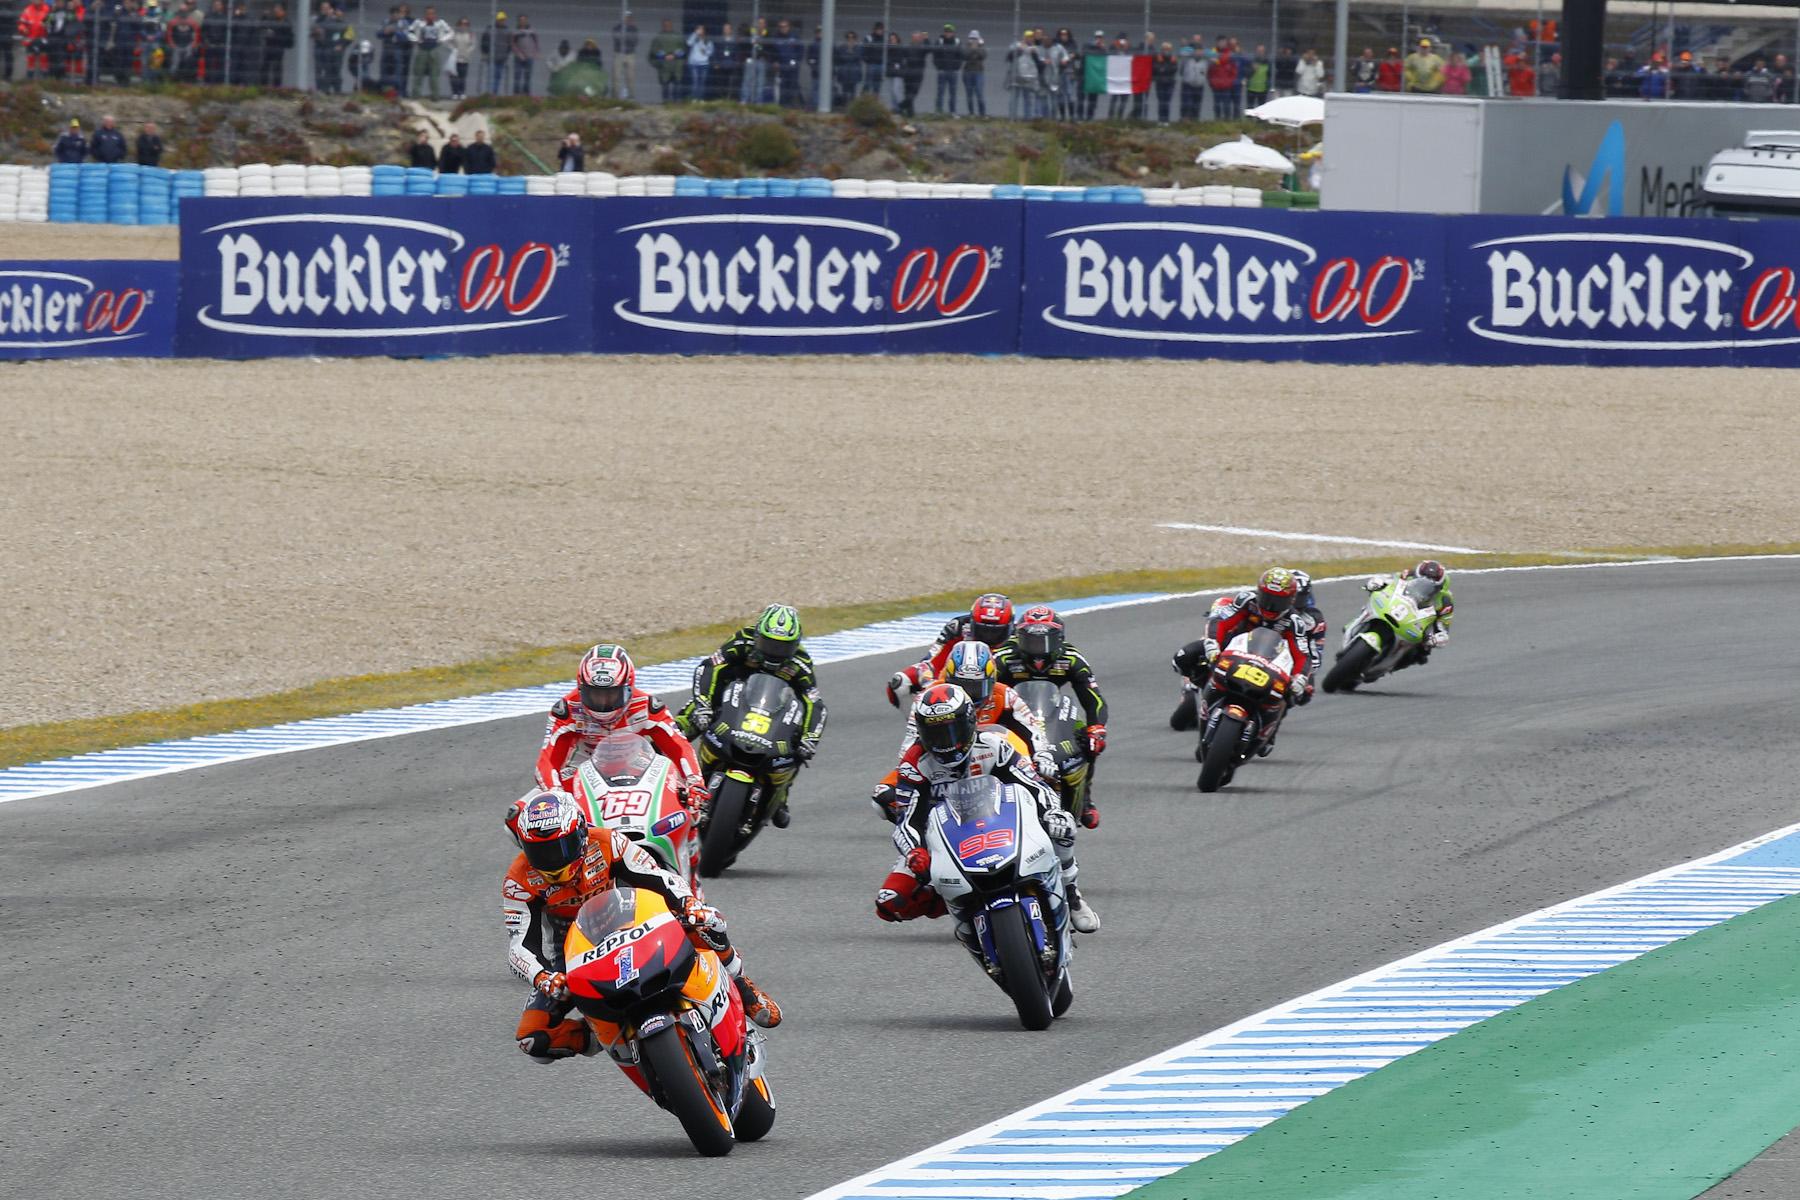 2012 10 11 IMG 2012 10 11 110556 motogp jerez2012 carrera30042012 10